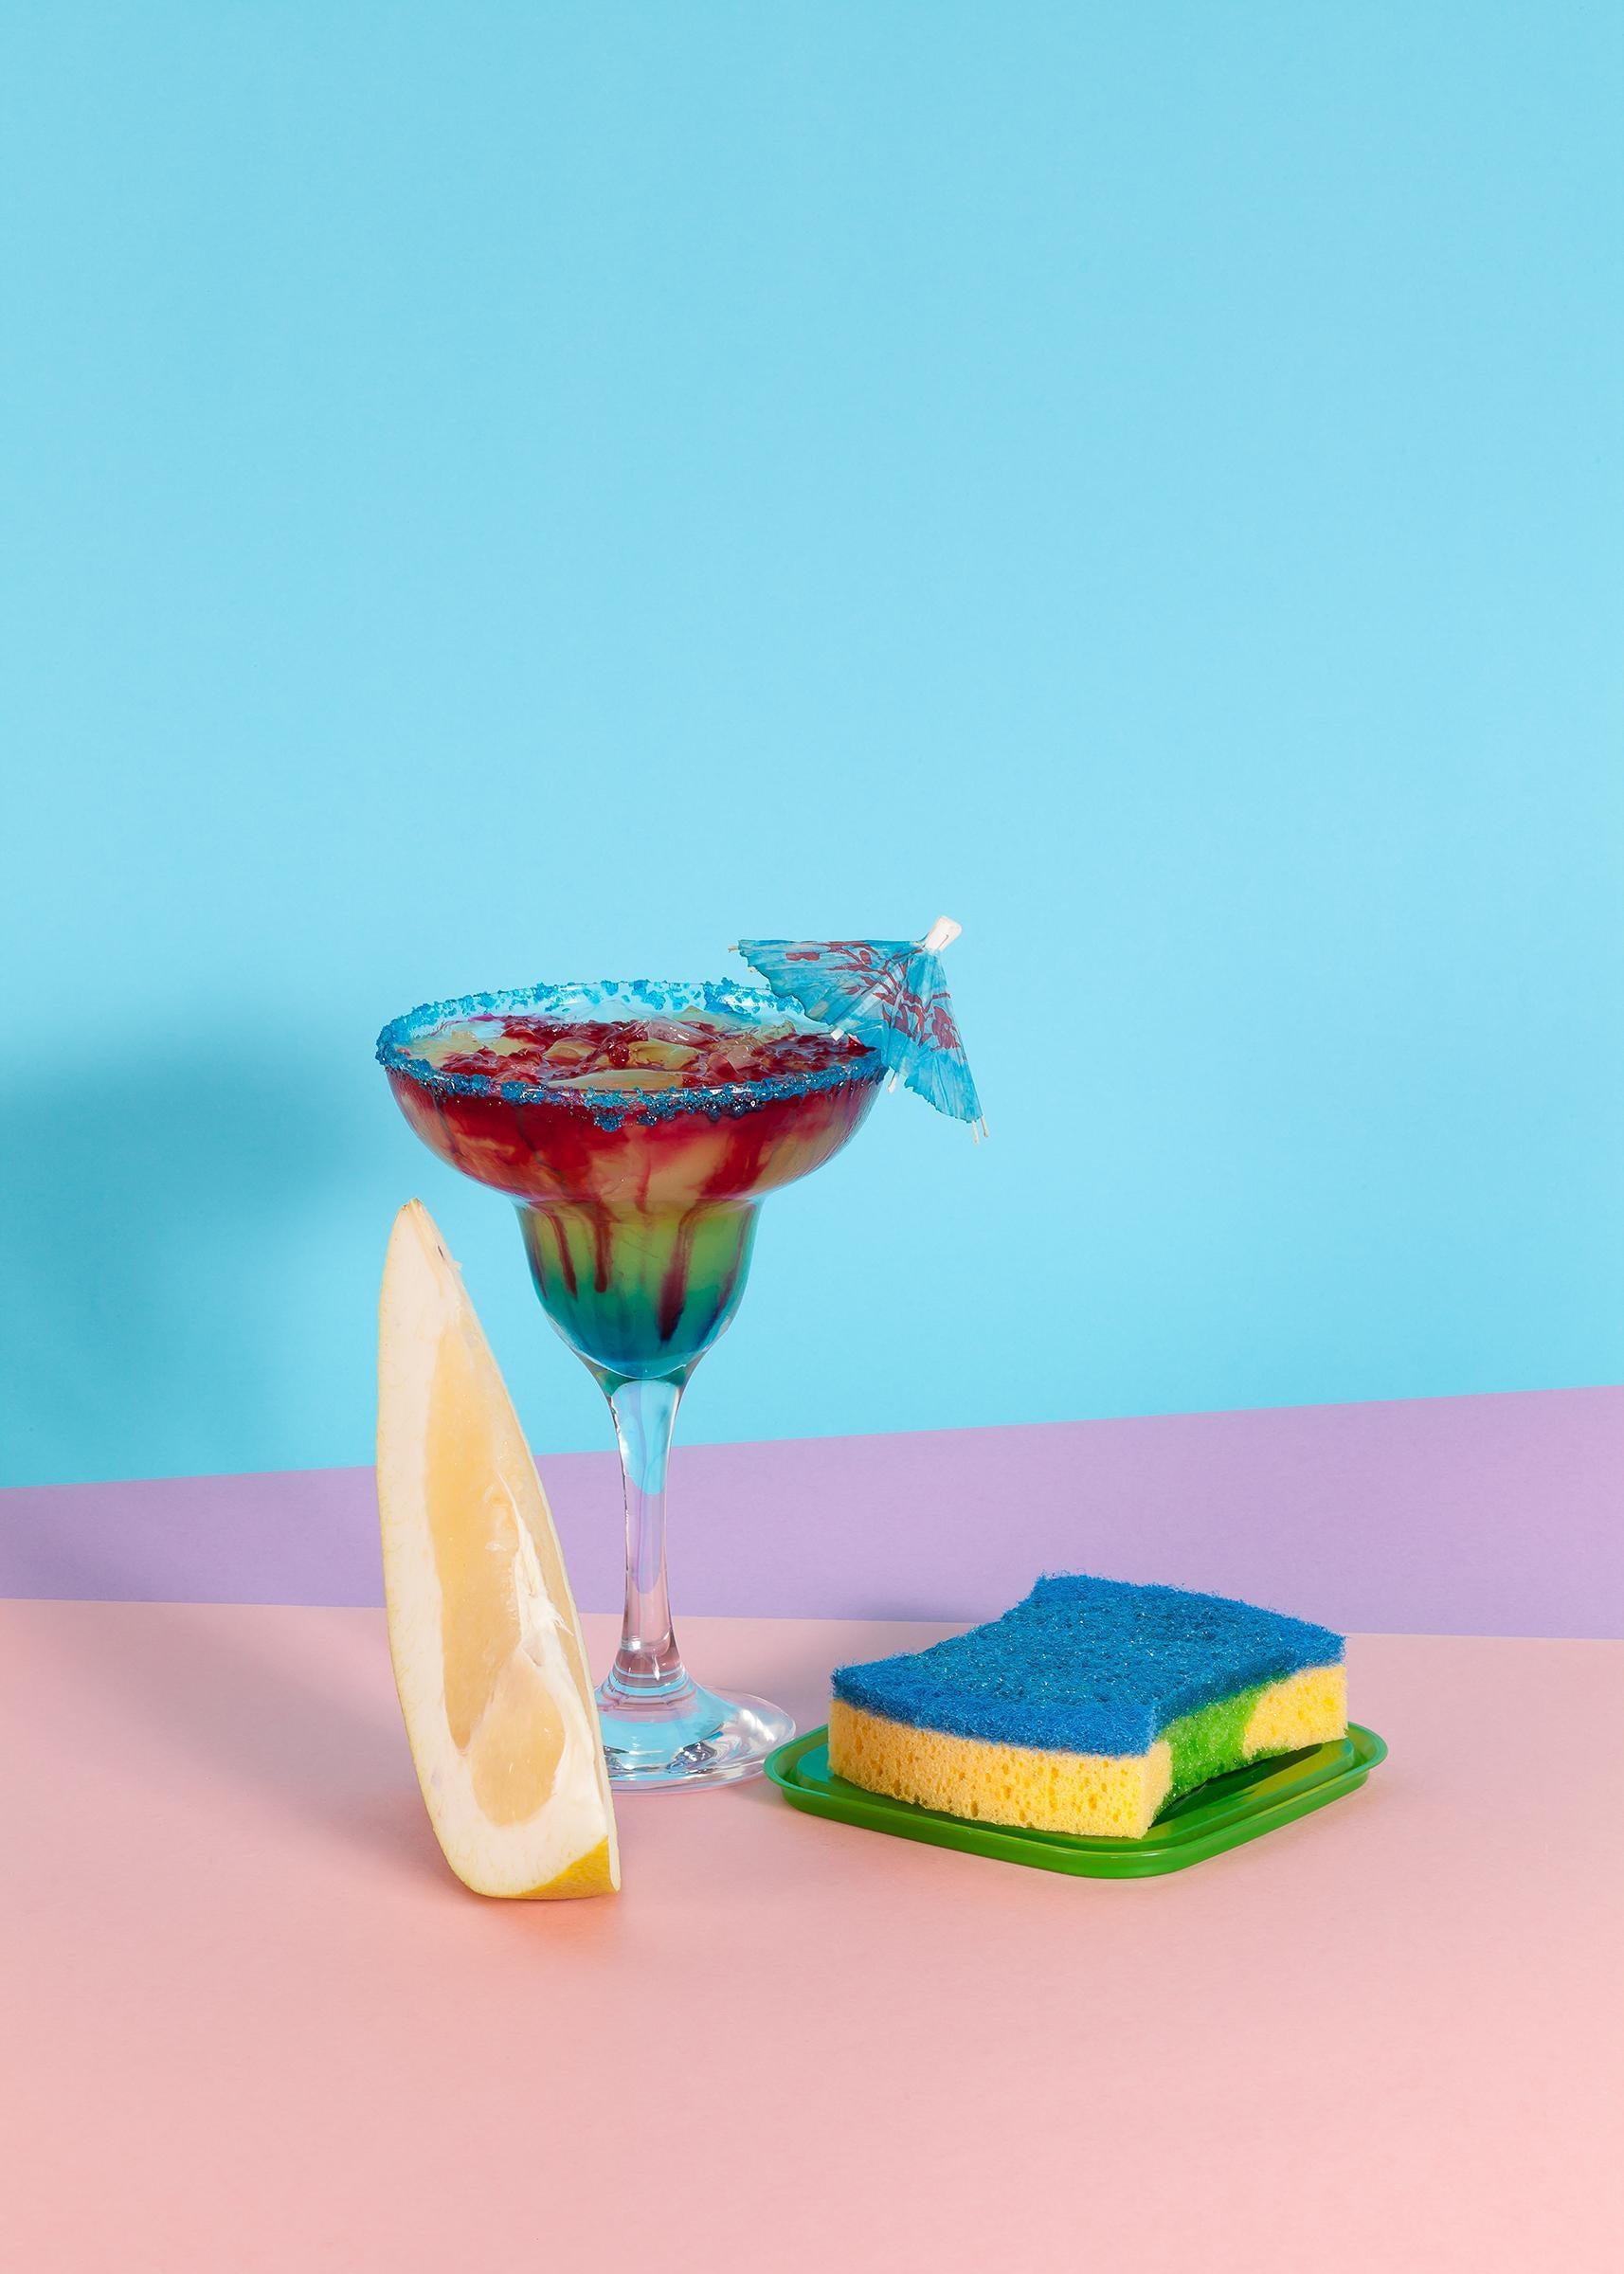 Sexy Miami Futuristic Cocktail Lounge, Giclée, Limited Edition, Pastel Palette